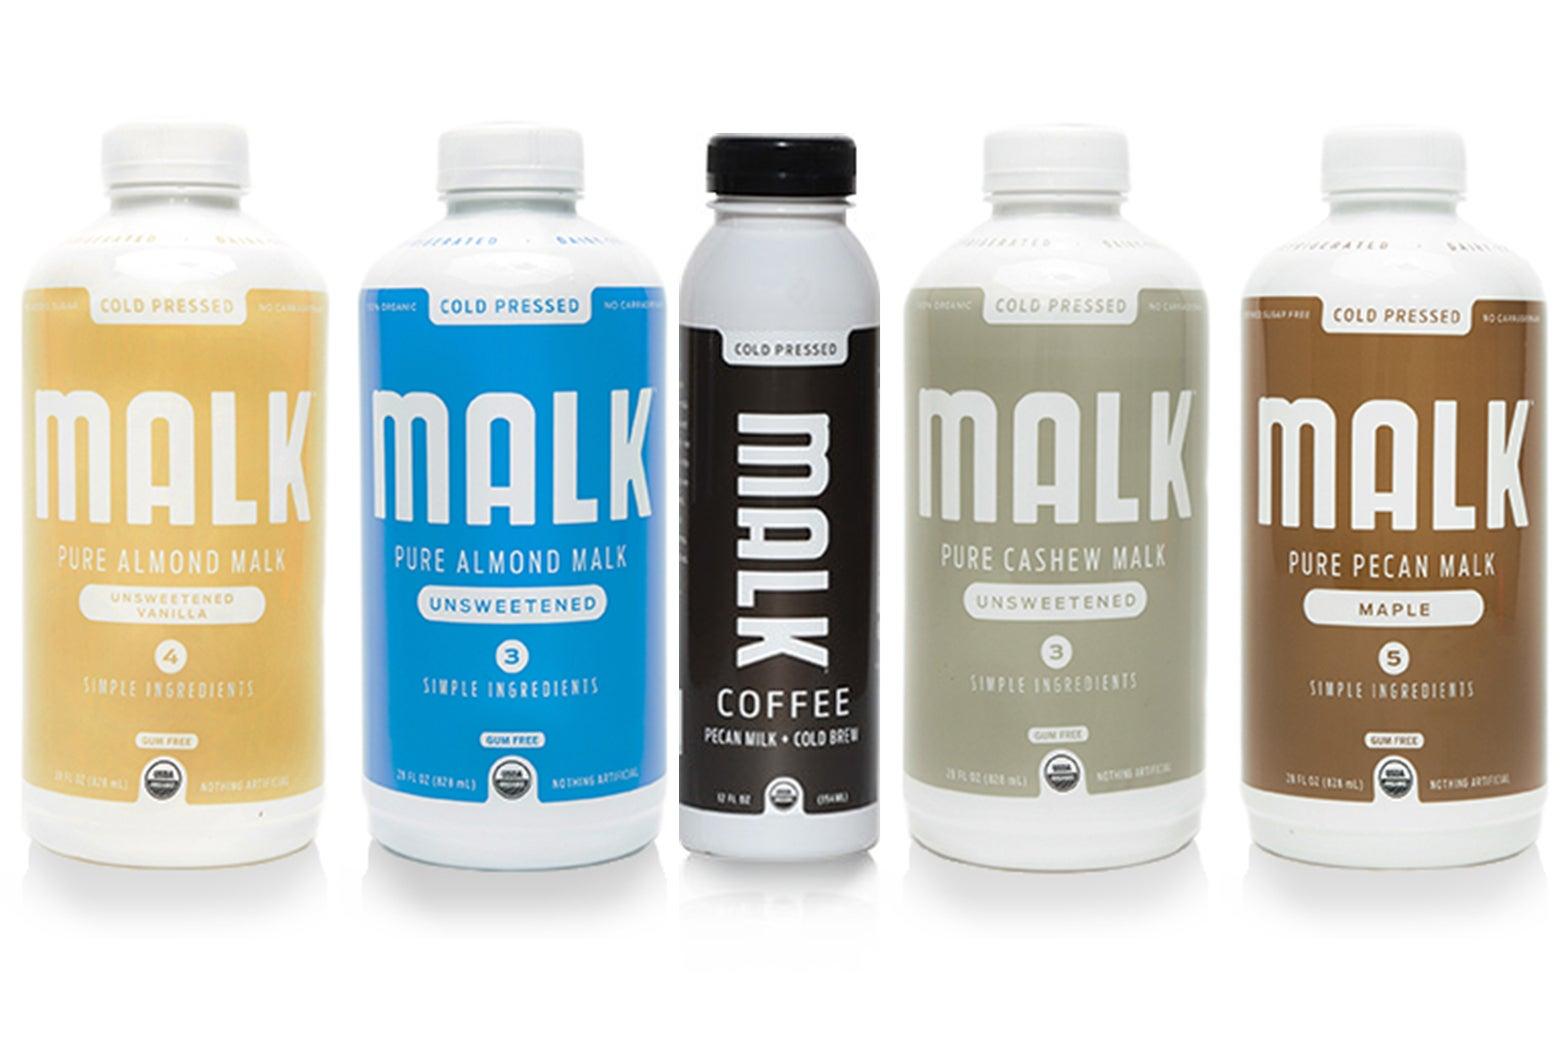 Five different varieties of Malk brand beverages.